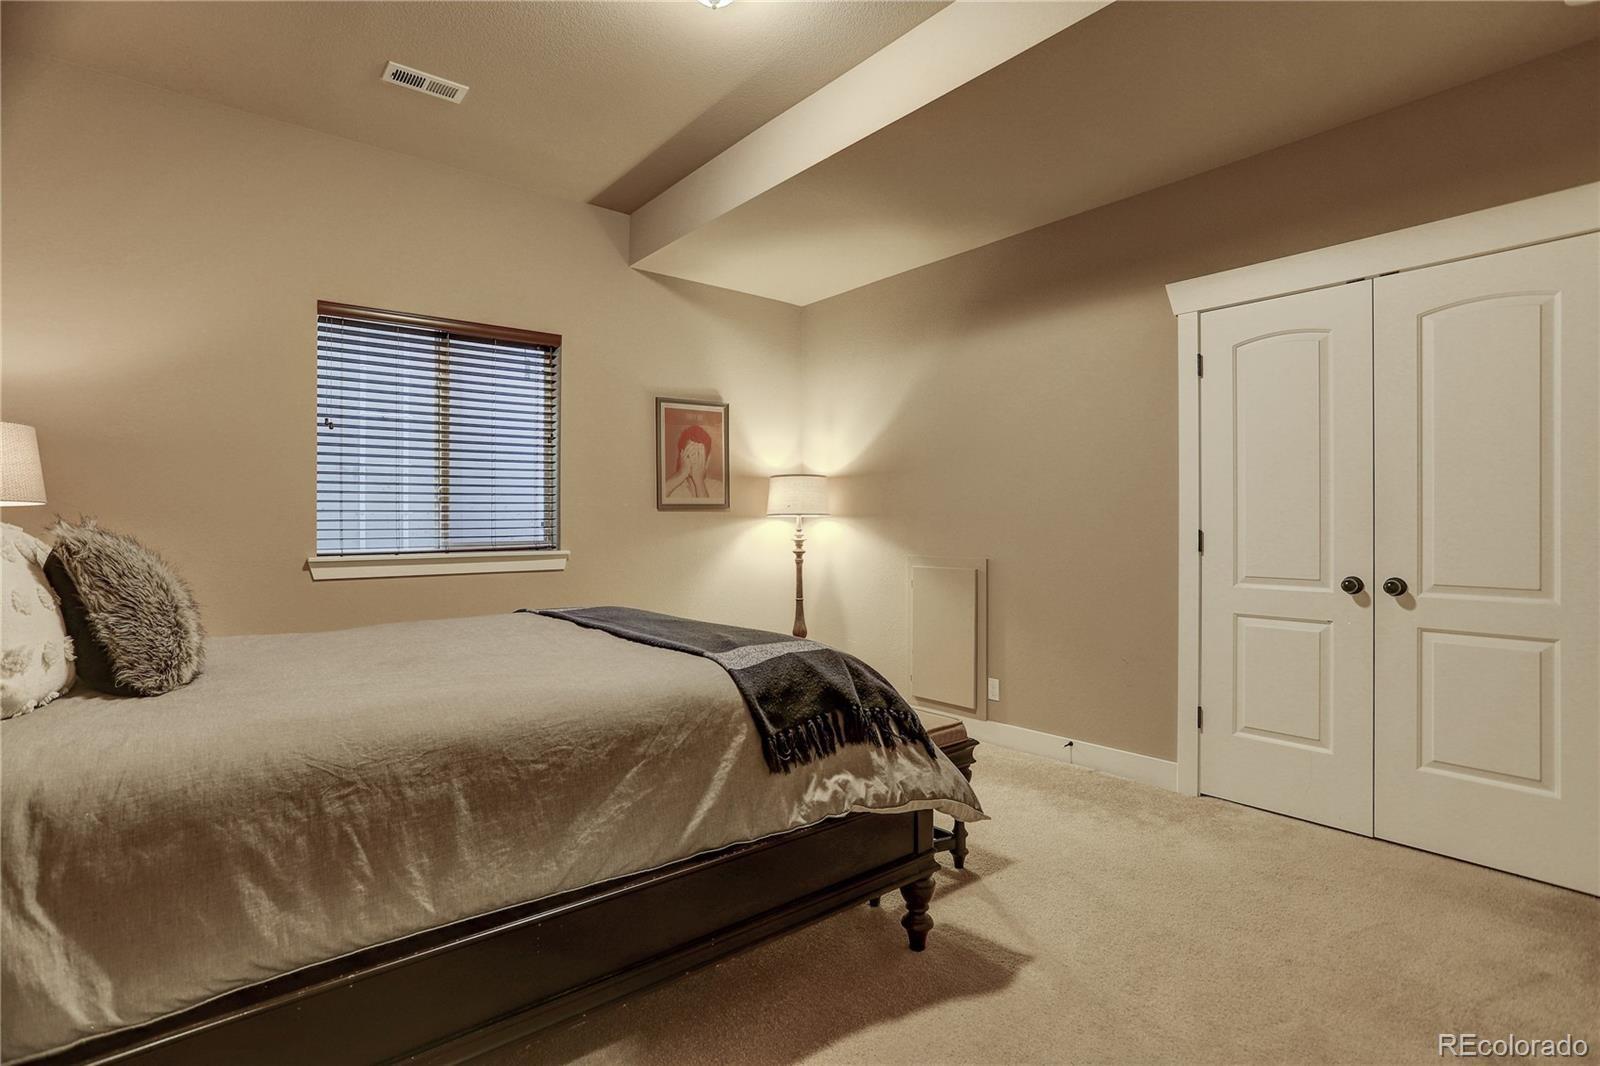 MLS# 6992885 - 26 - 8084 E 31st Avenue, Denver, CO 80238